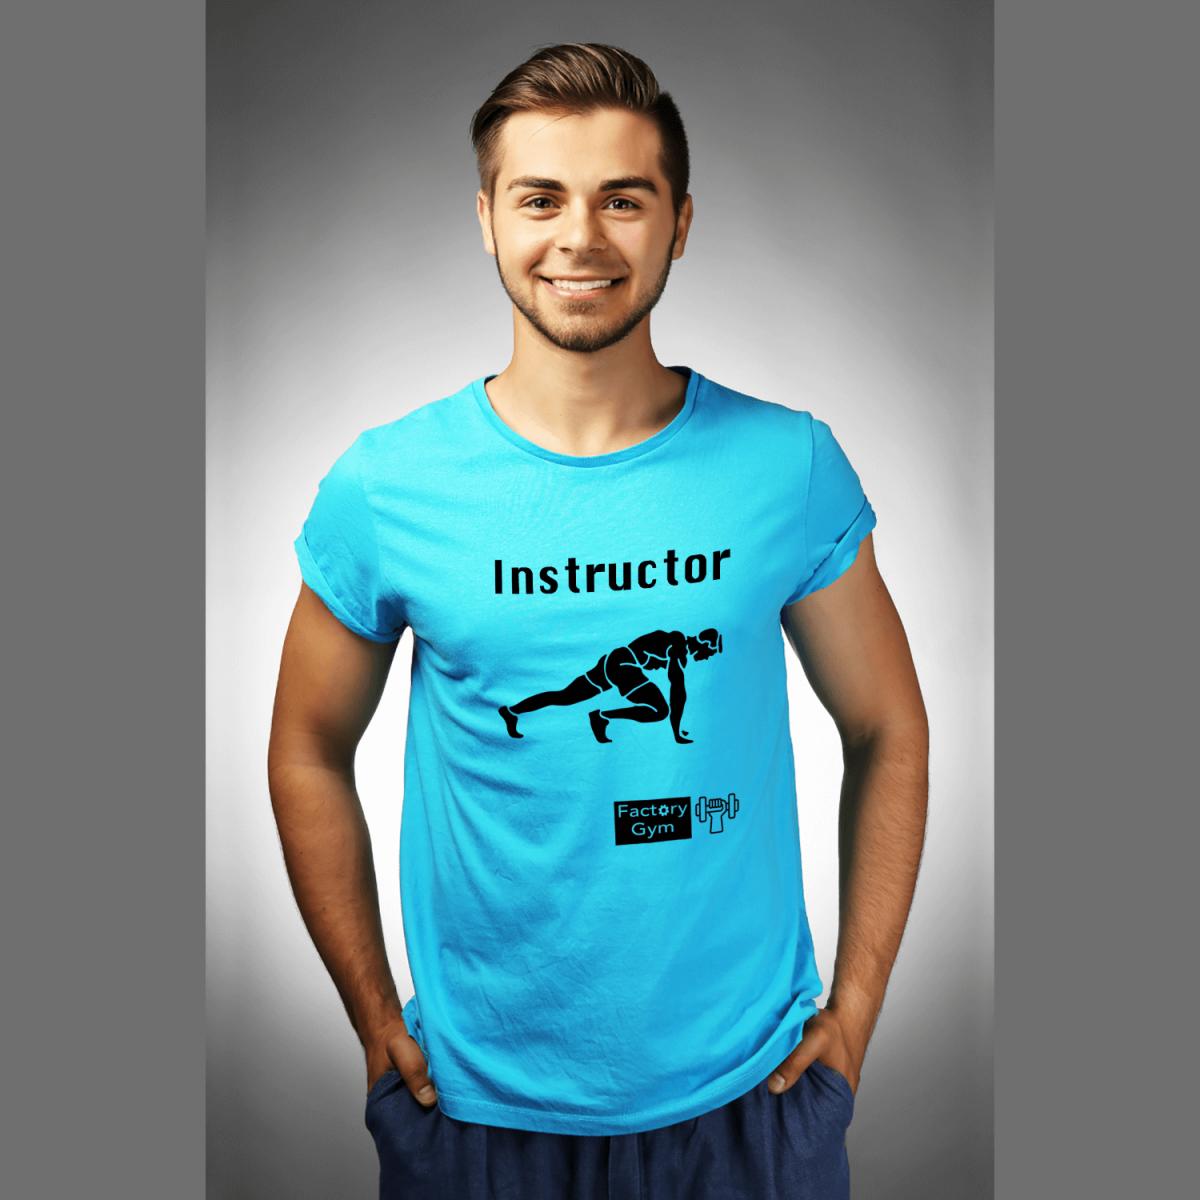 Custom Printed T-Shirt - Instructor